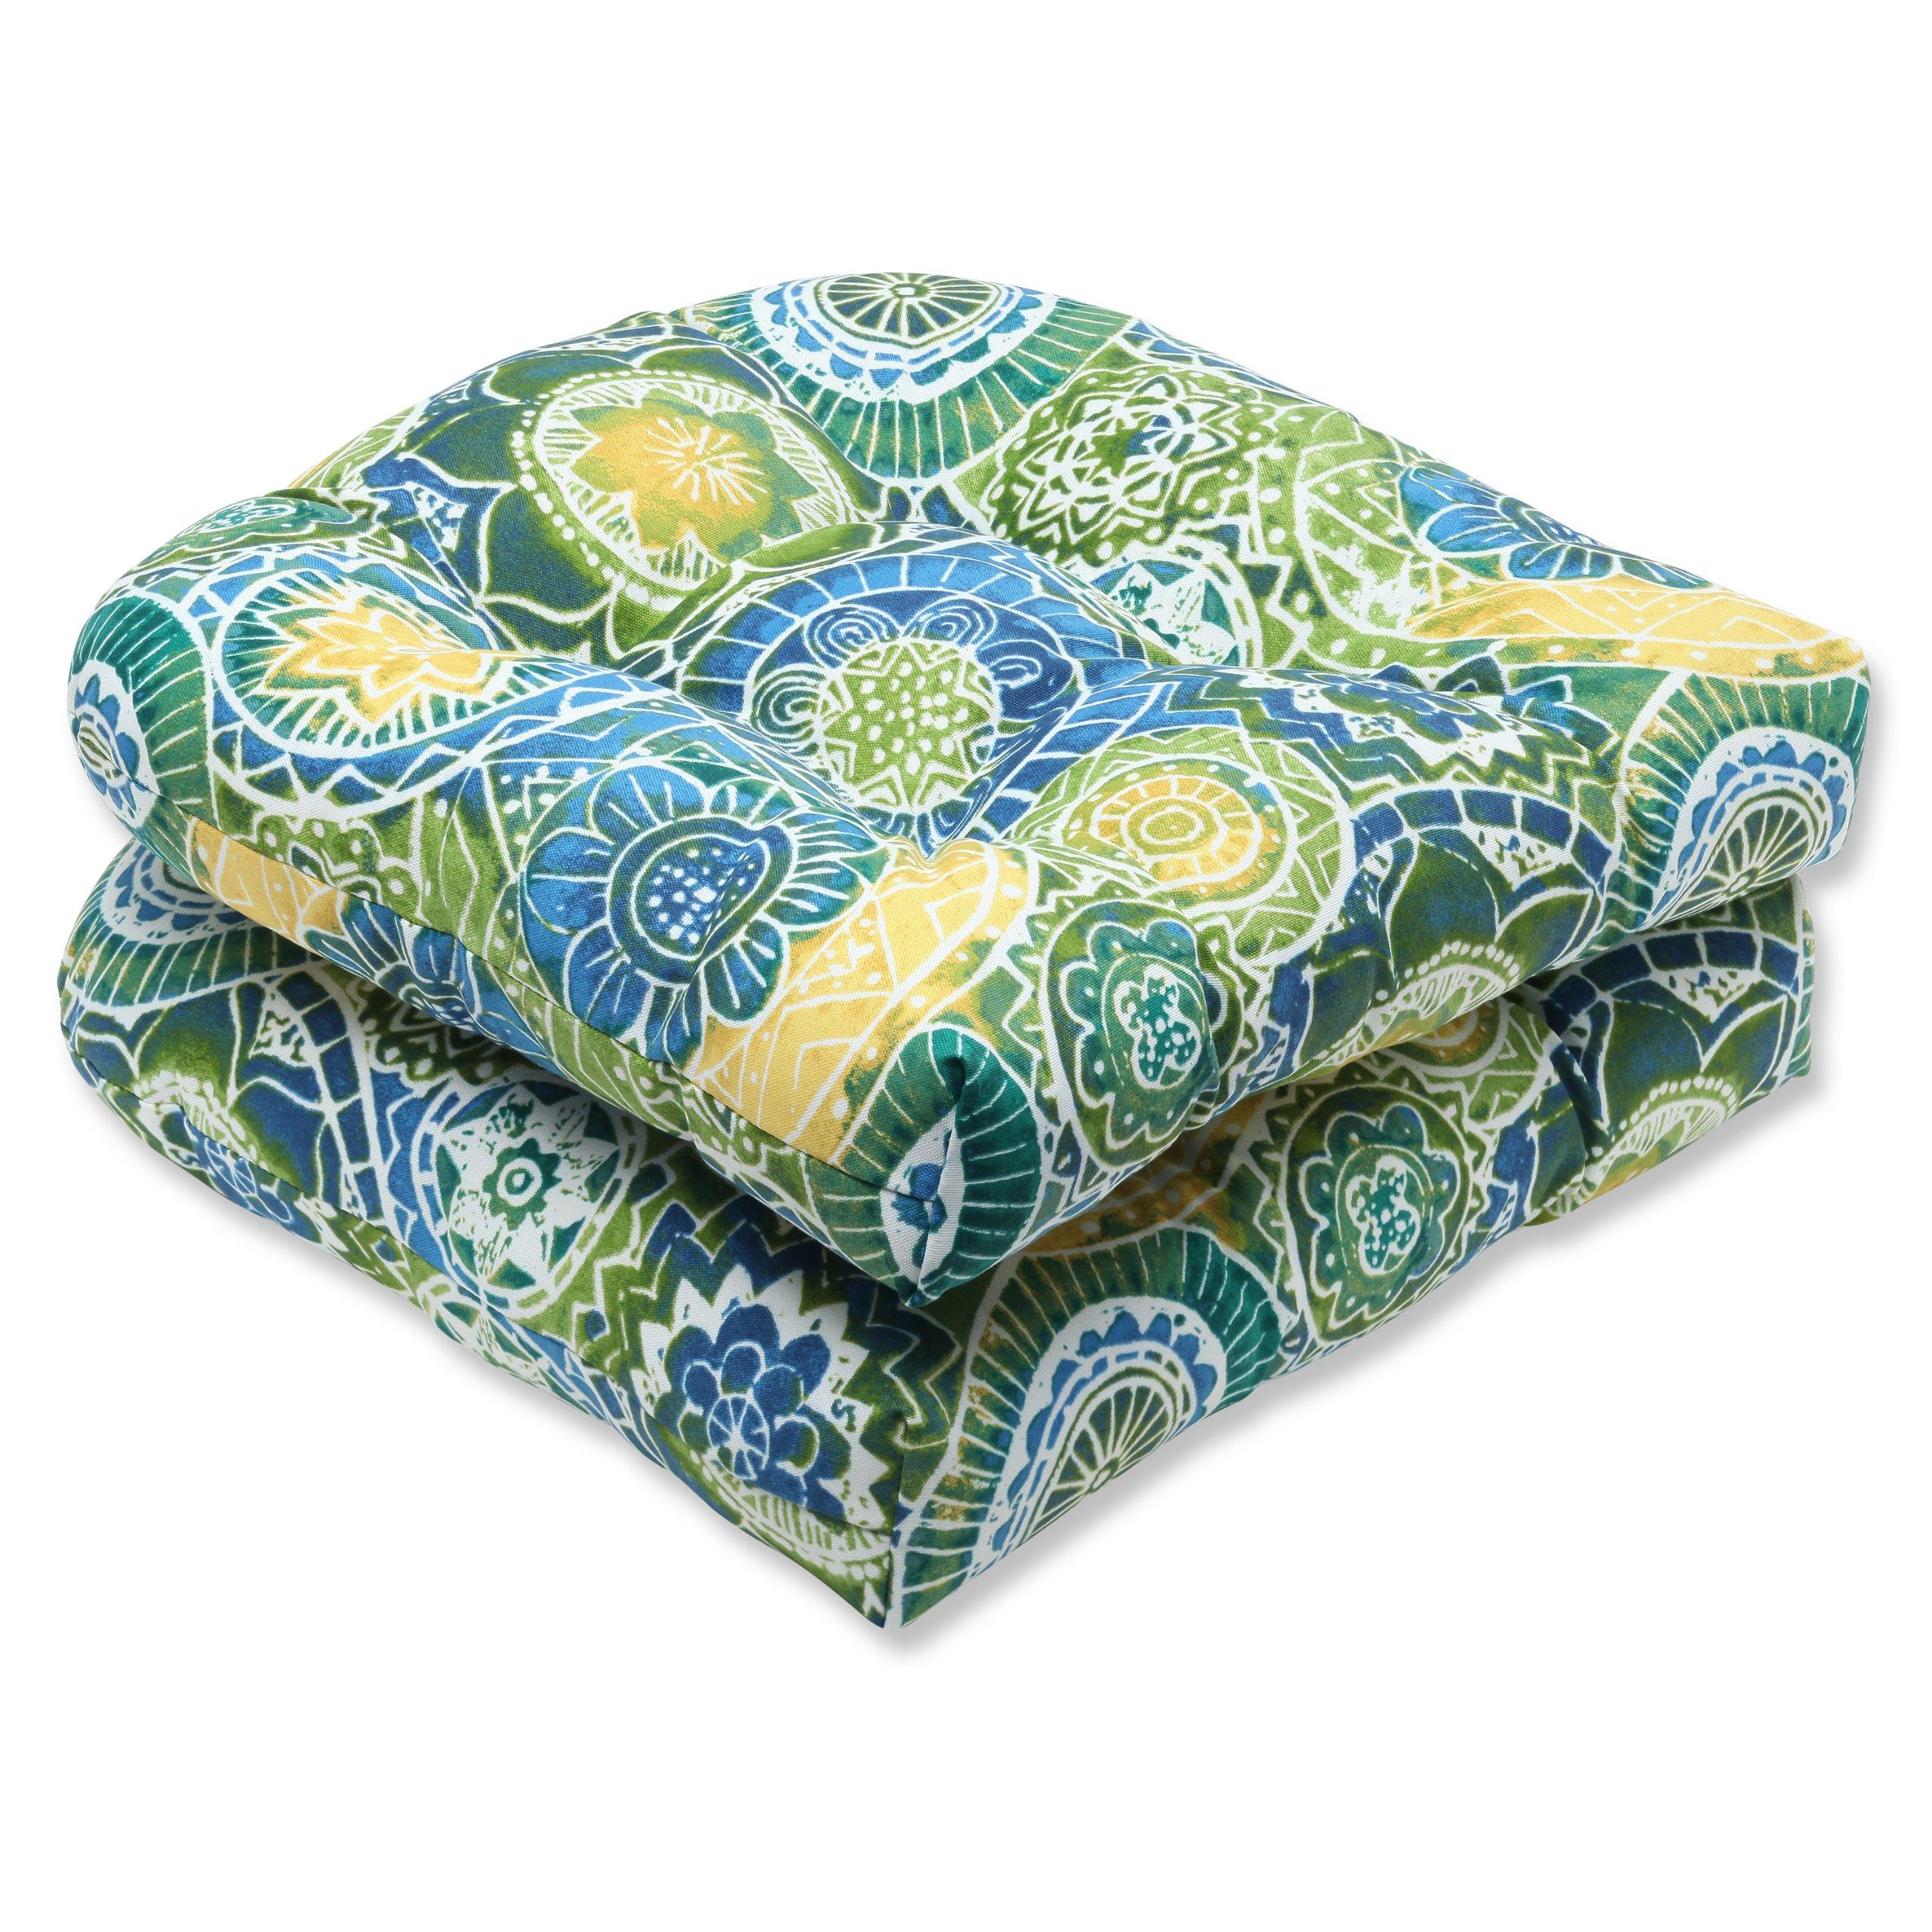 Pillow Perfect Outdoor Omnia Lagoon Wicker Seat